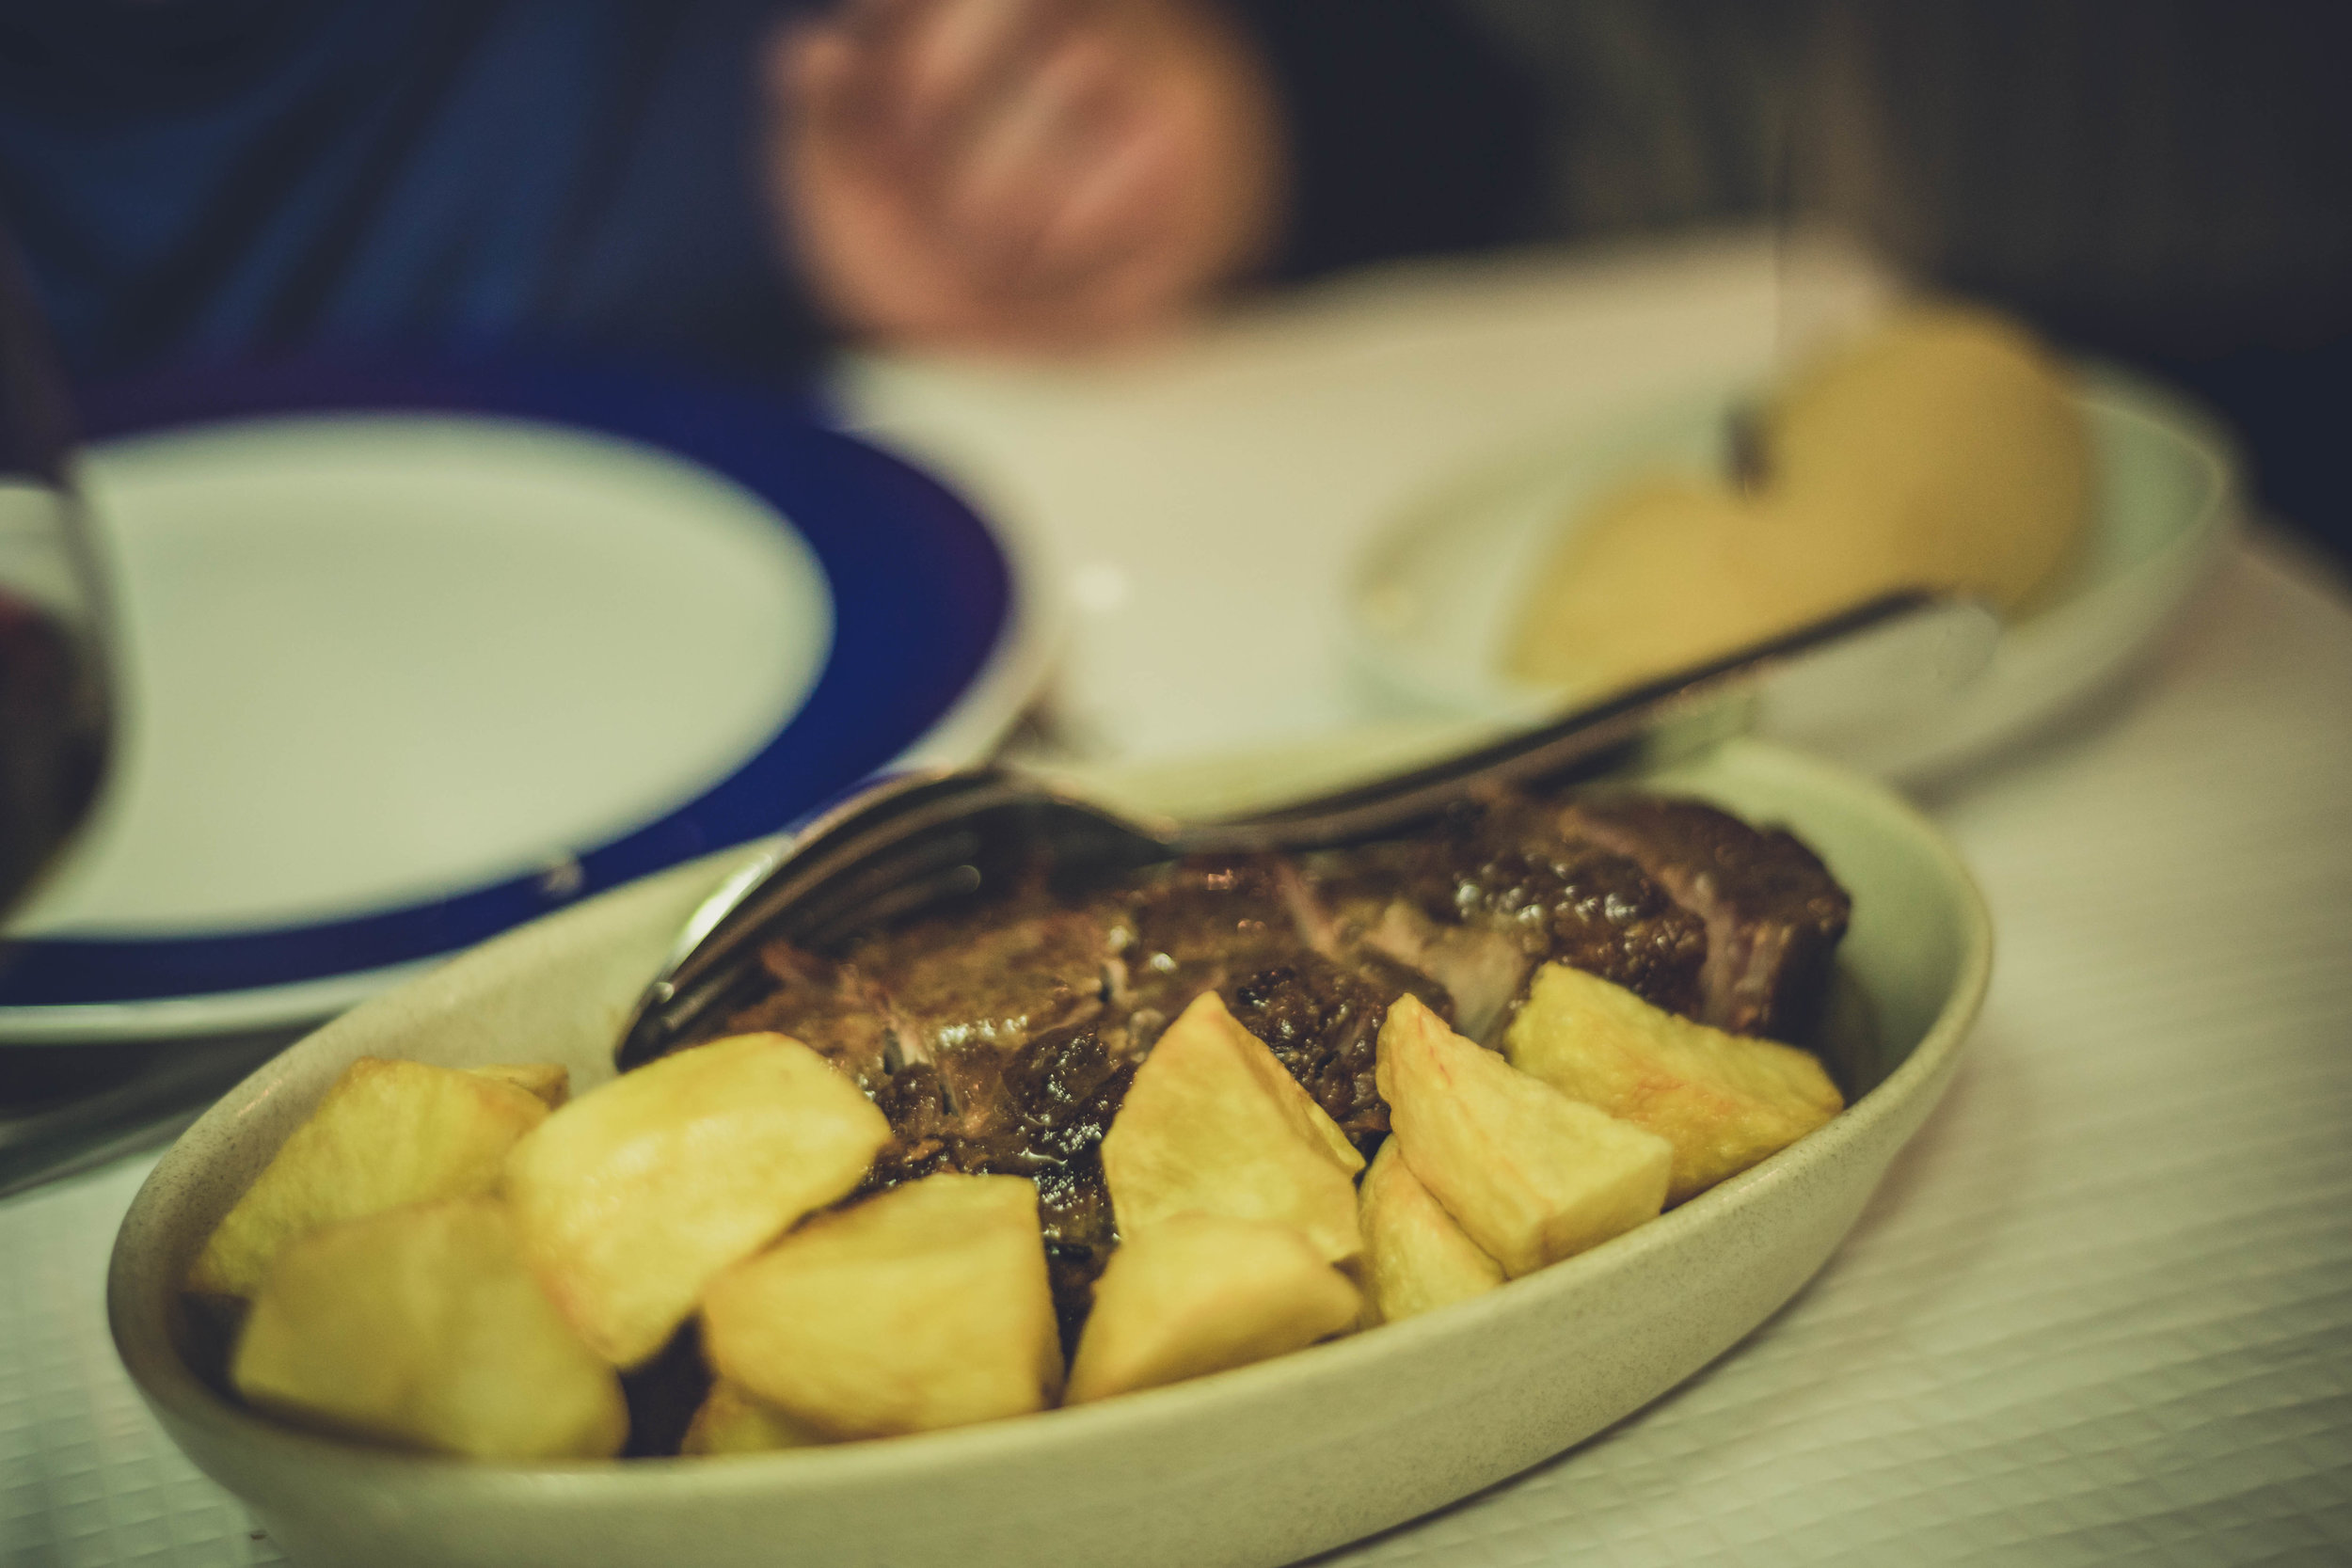 Taberna Típica Quarta Feira. food. great.Evora. Roman Ruins. Portugal. Alentejo. Piliers. Roman city. ancient roman town. travel. adventure. history. historical. wine. beef fun time.jpg